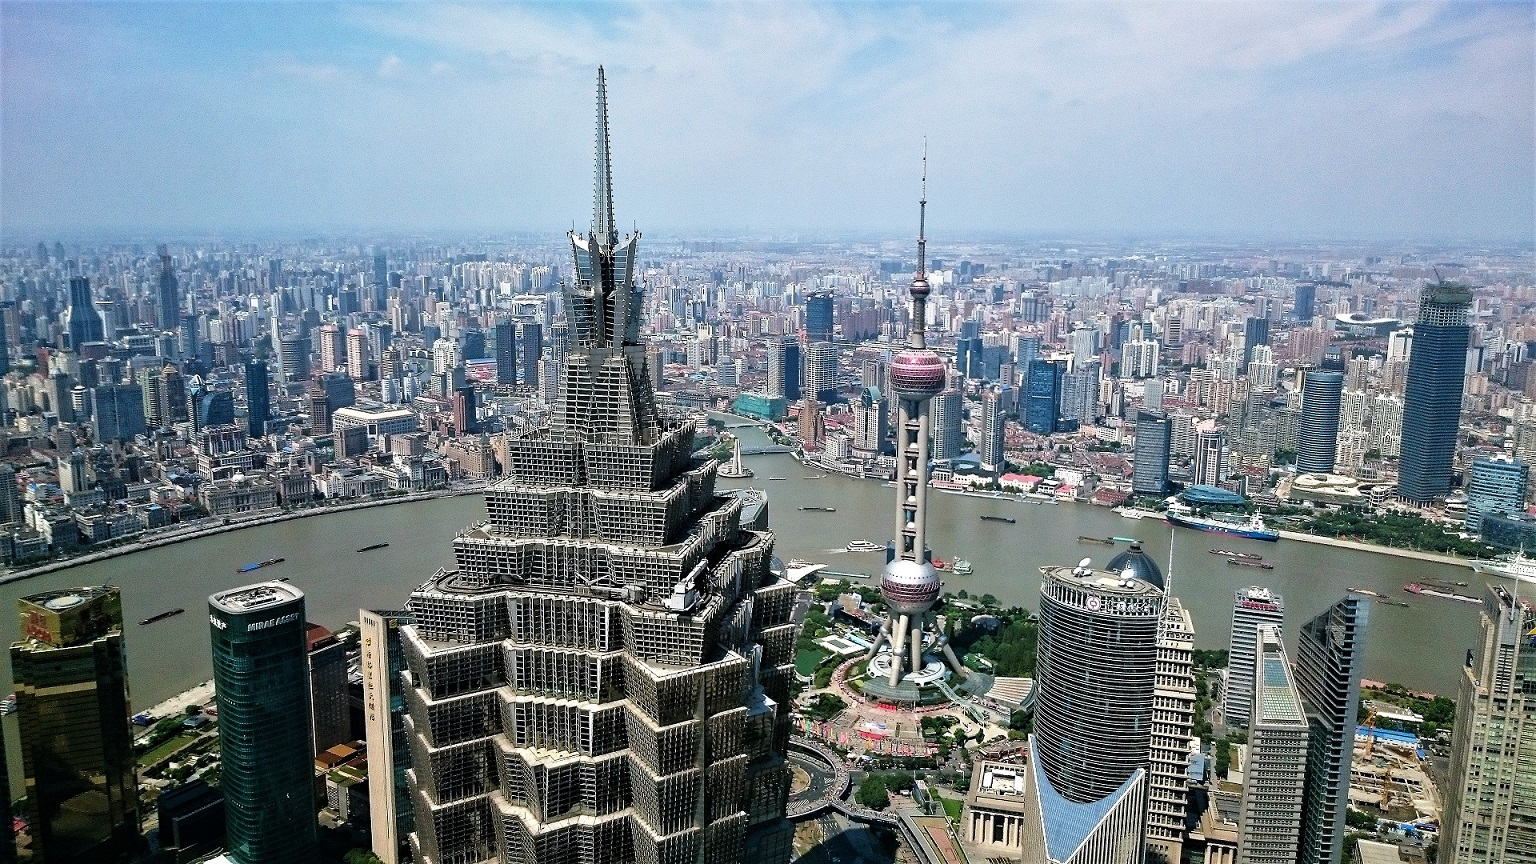 Park hyatt shanghai review luxury heights one tech - Shanghai infinity pool ...